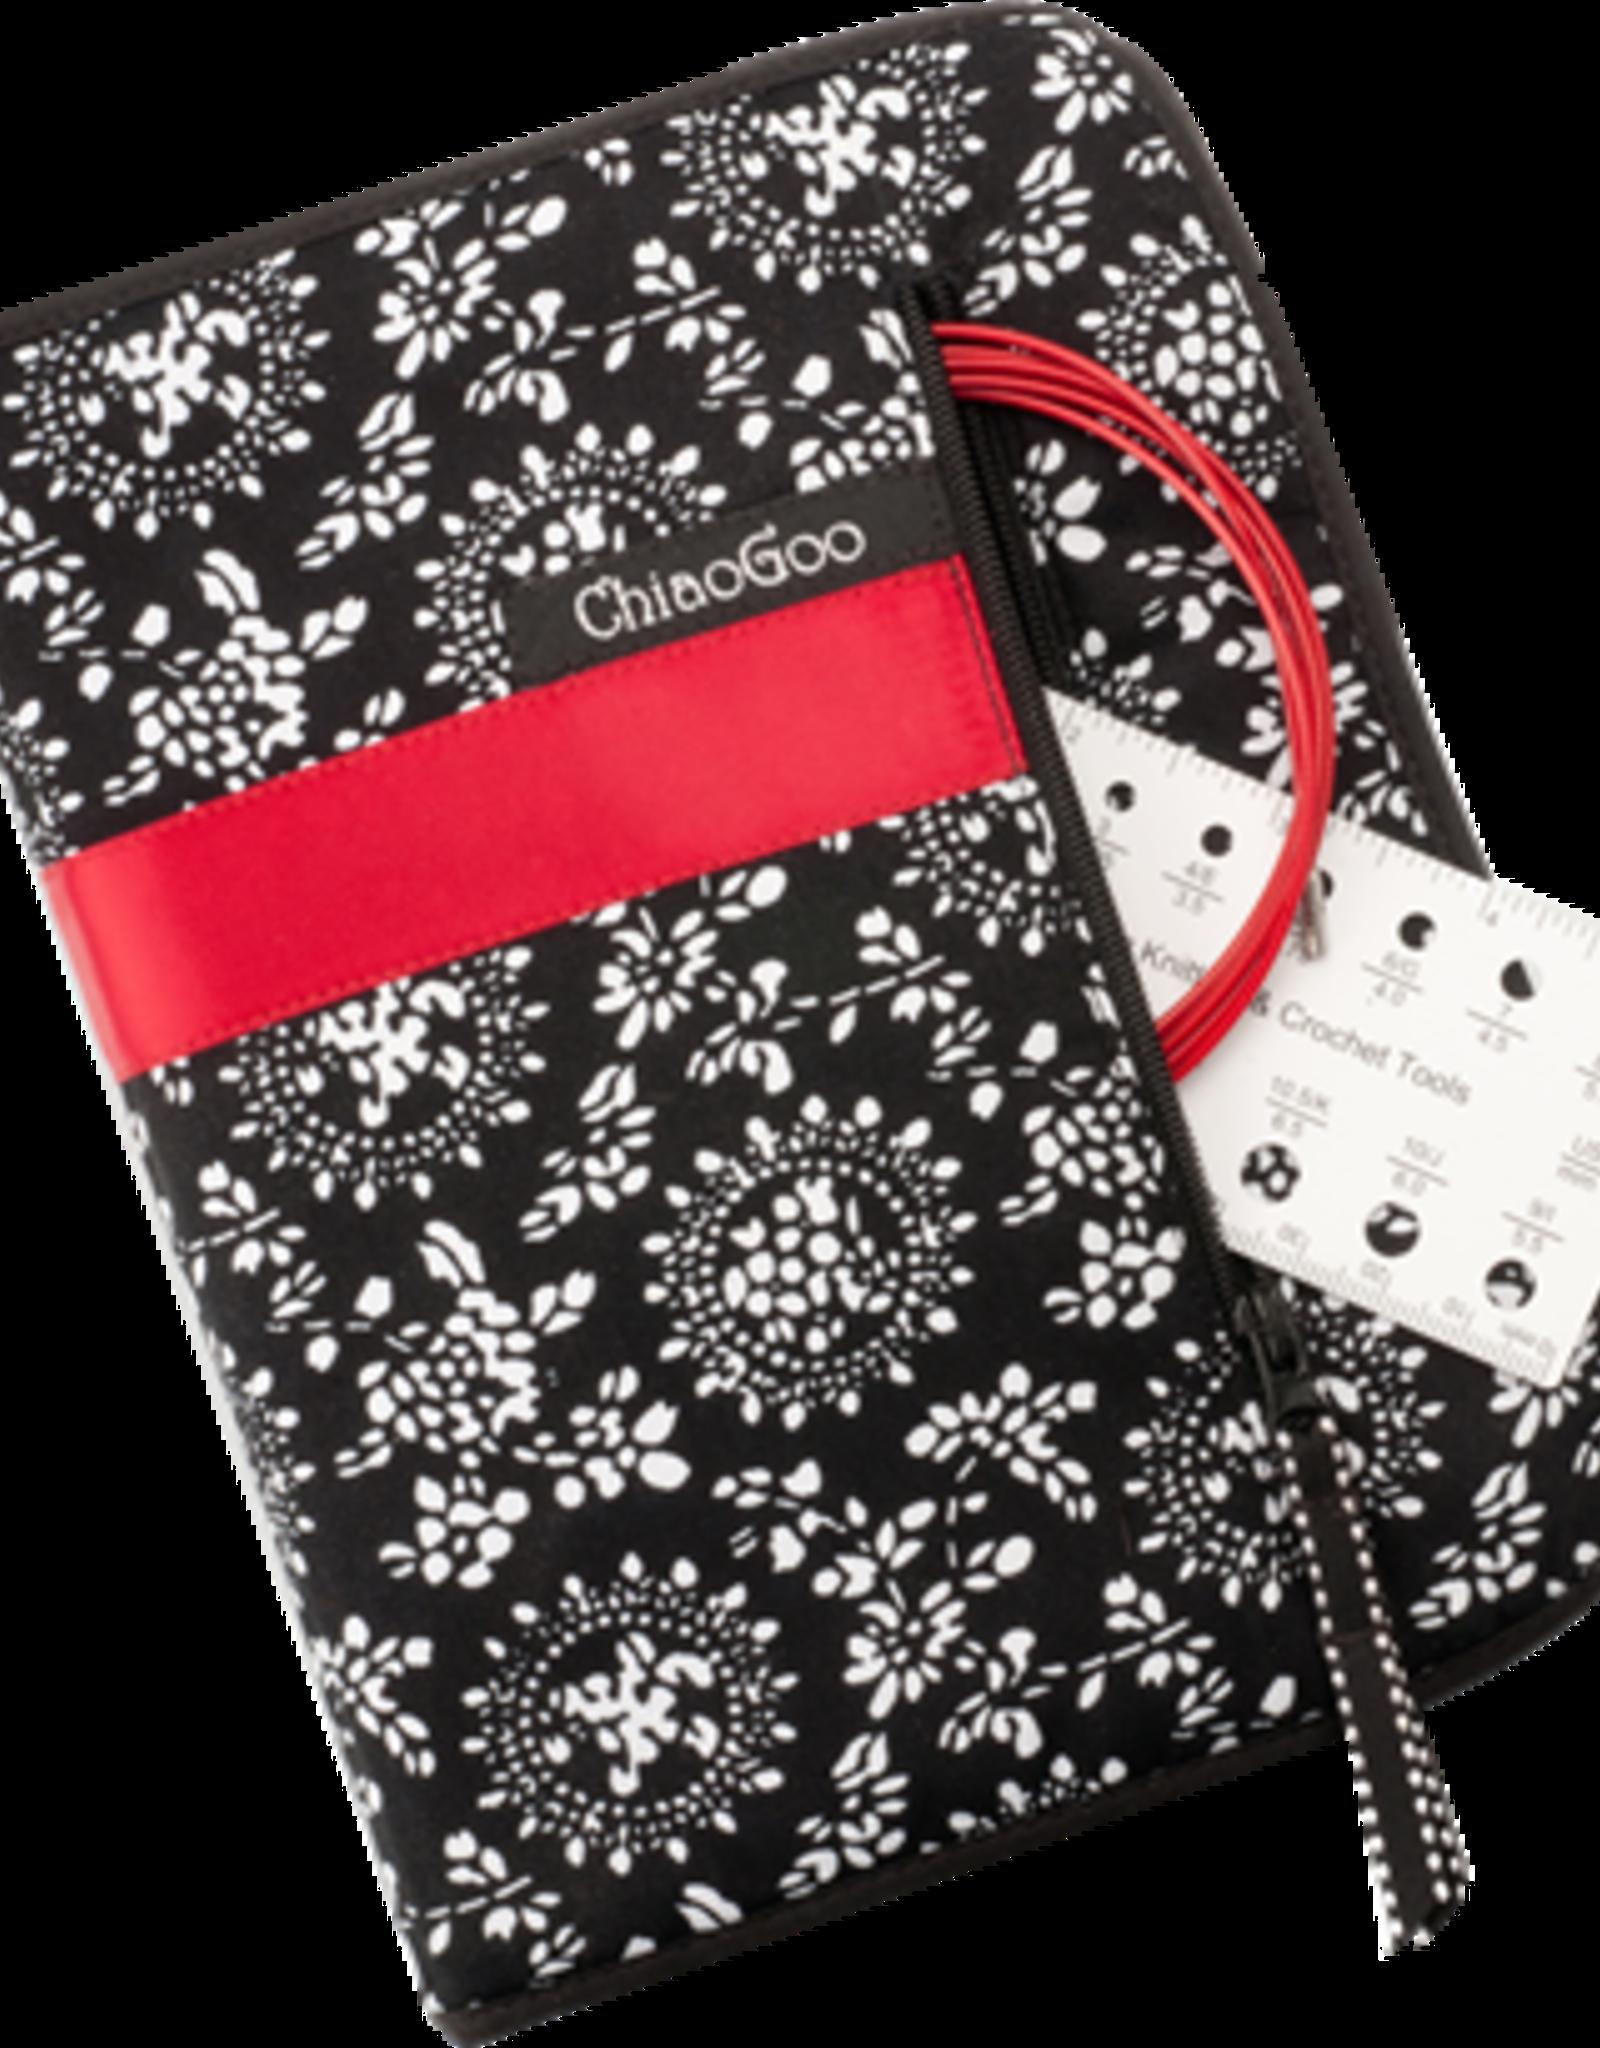 "Chiaogoo Twist Lace Interchanagble set Complete 4"" tips, US 2-15"